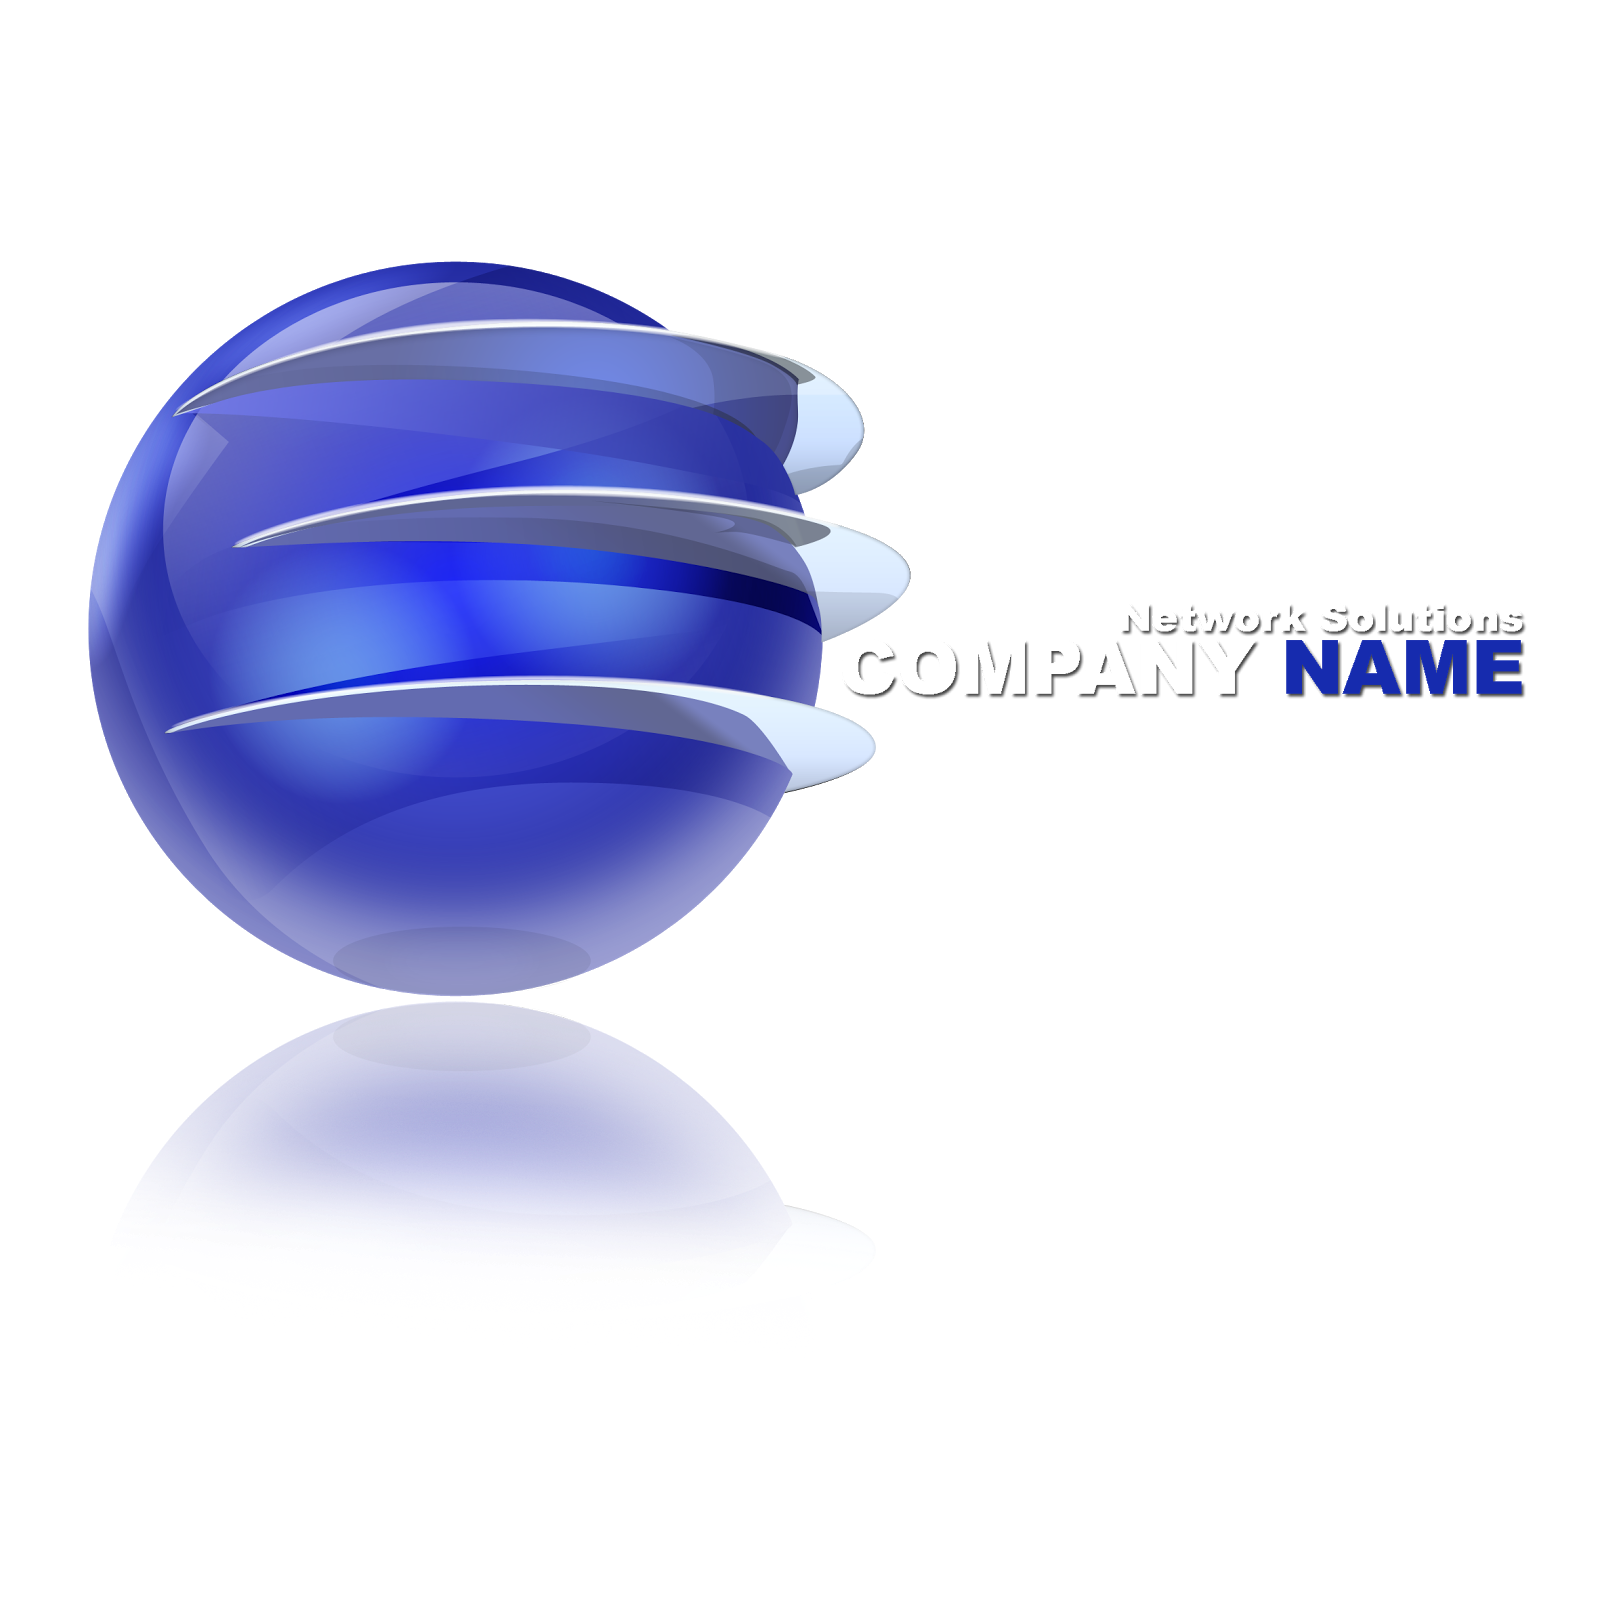 logo design psd تصميم لوجو رقم 161 fonxat gfx